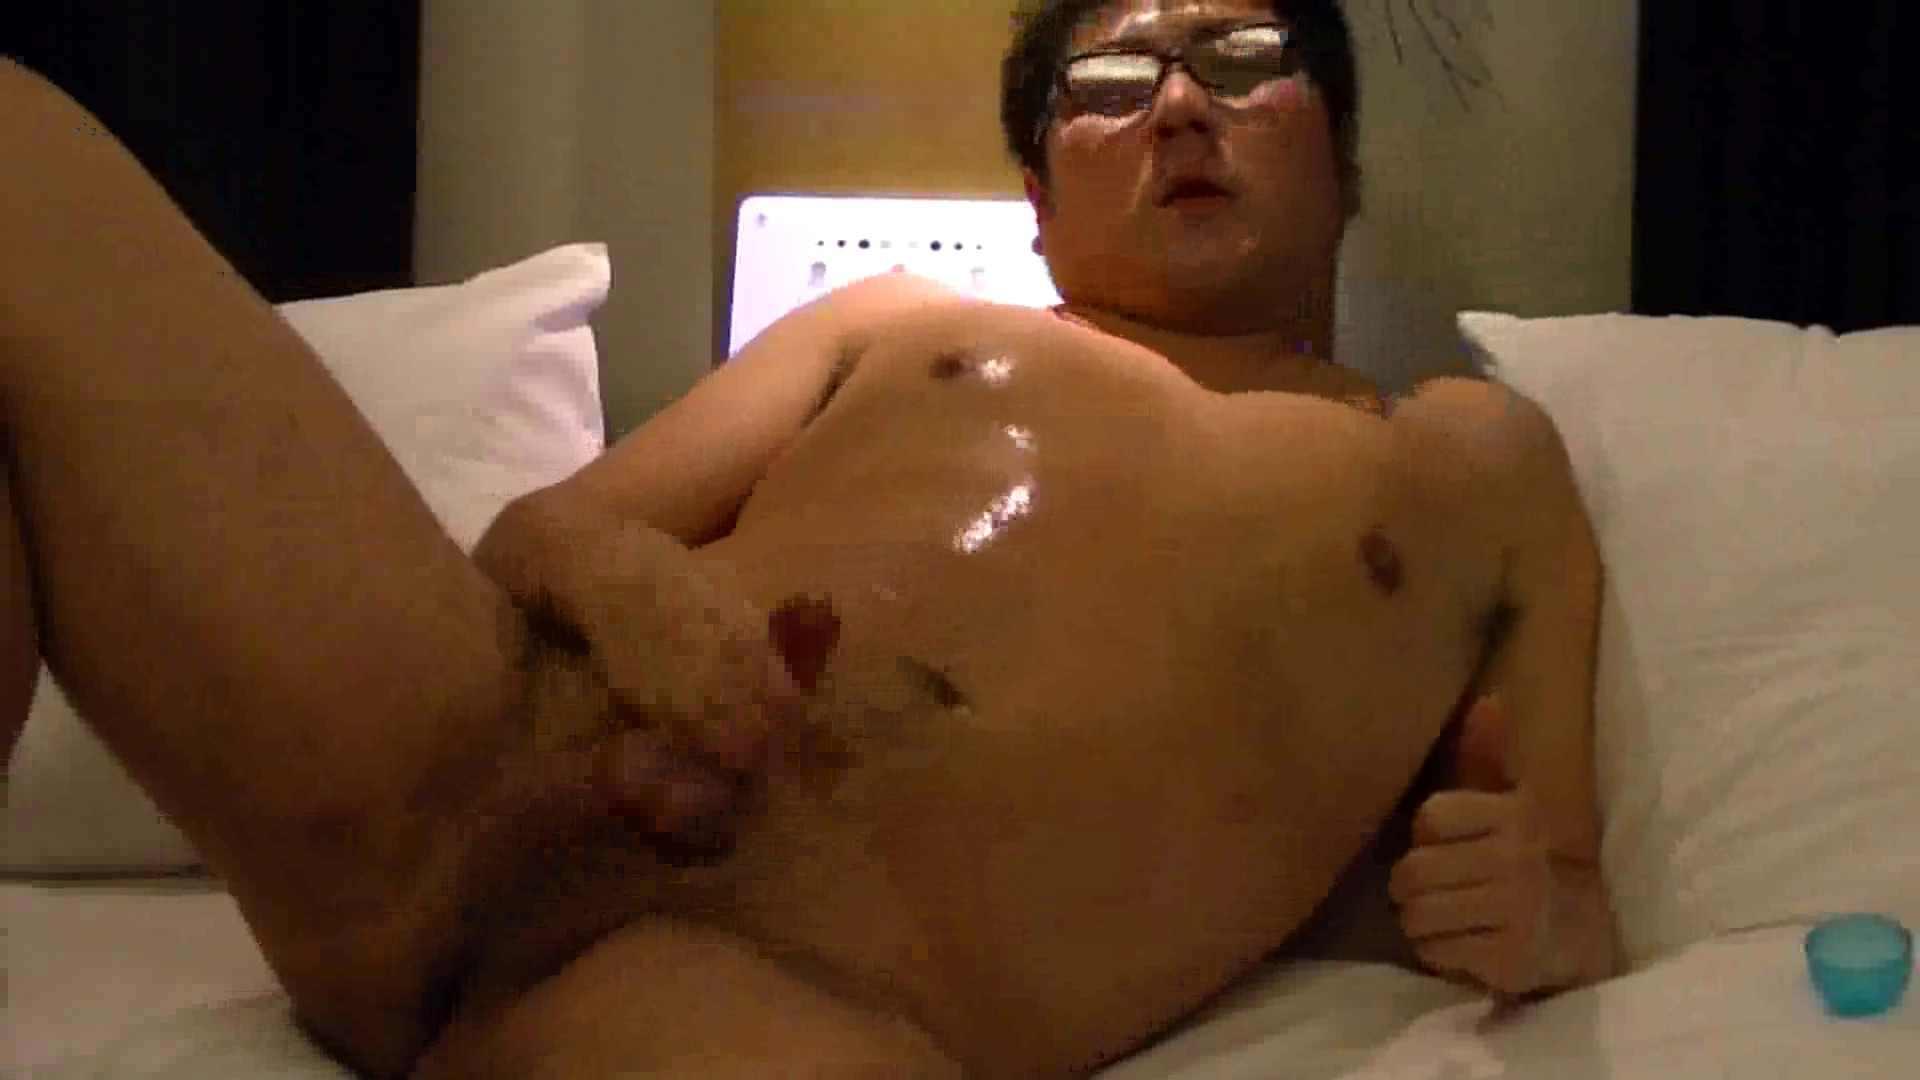 ONA見せカーニバル!! Vol5 エッチ ゲイ無修正ビデオ画像 108枚 61